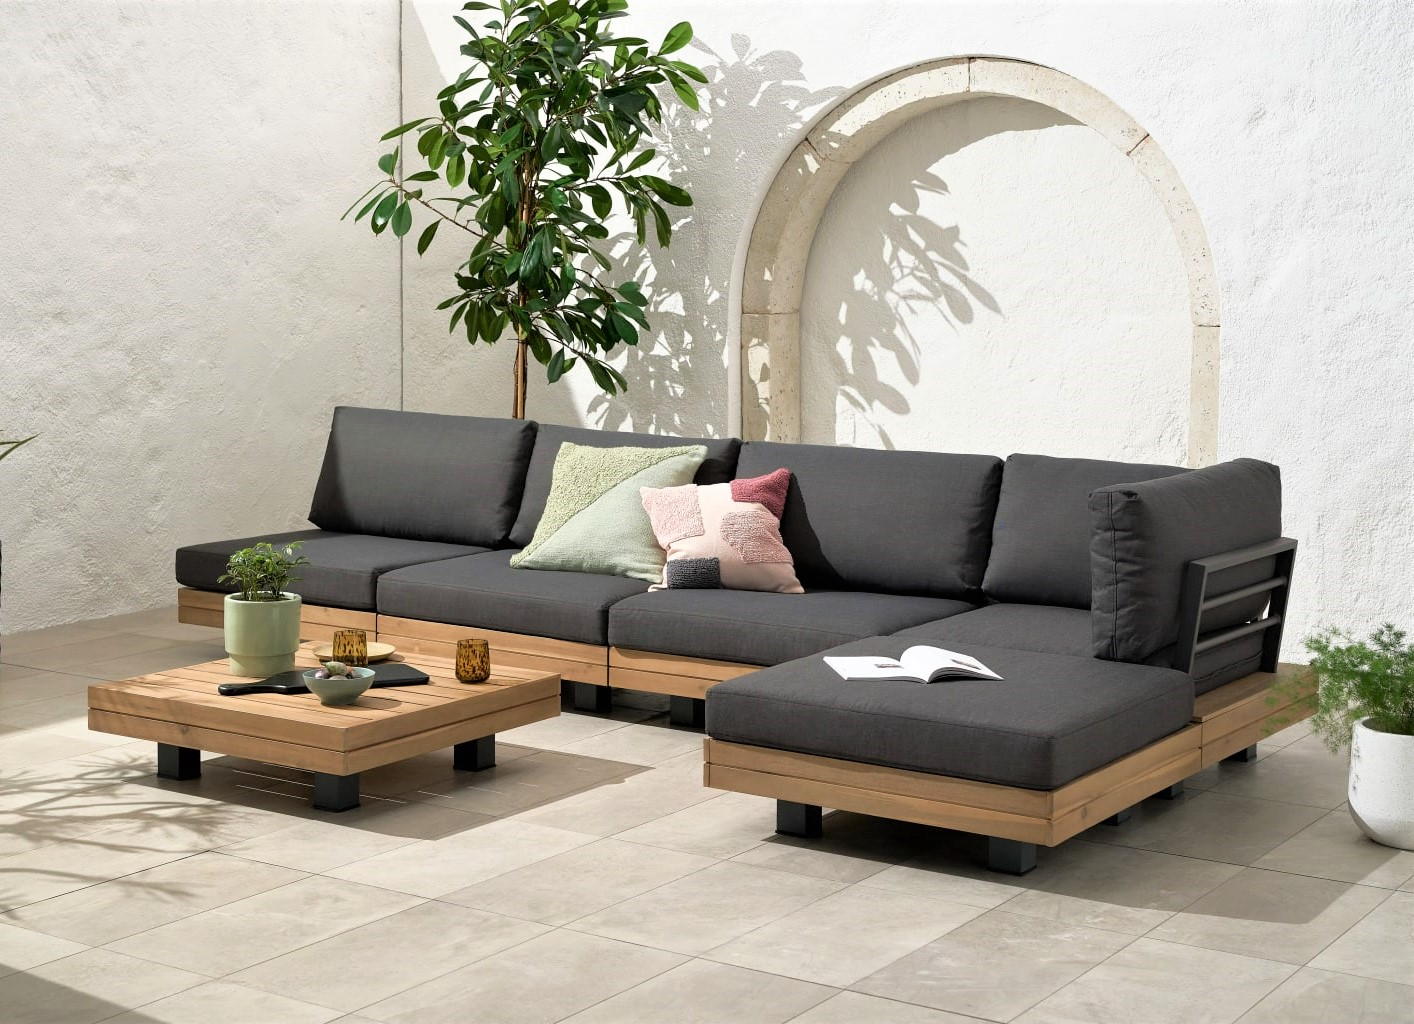 Avarna Corner Modular Lounge Set